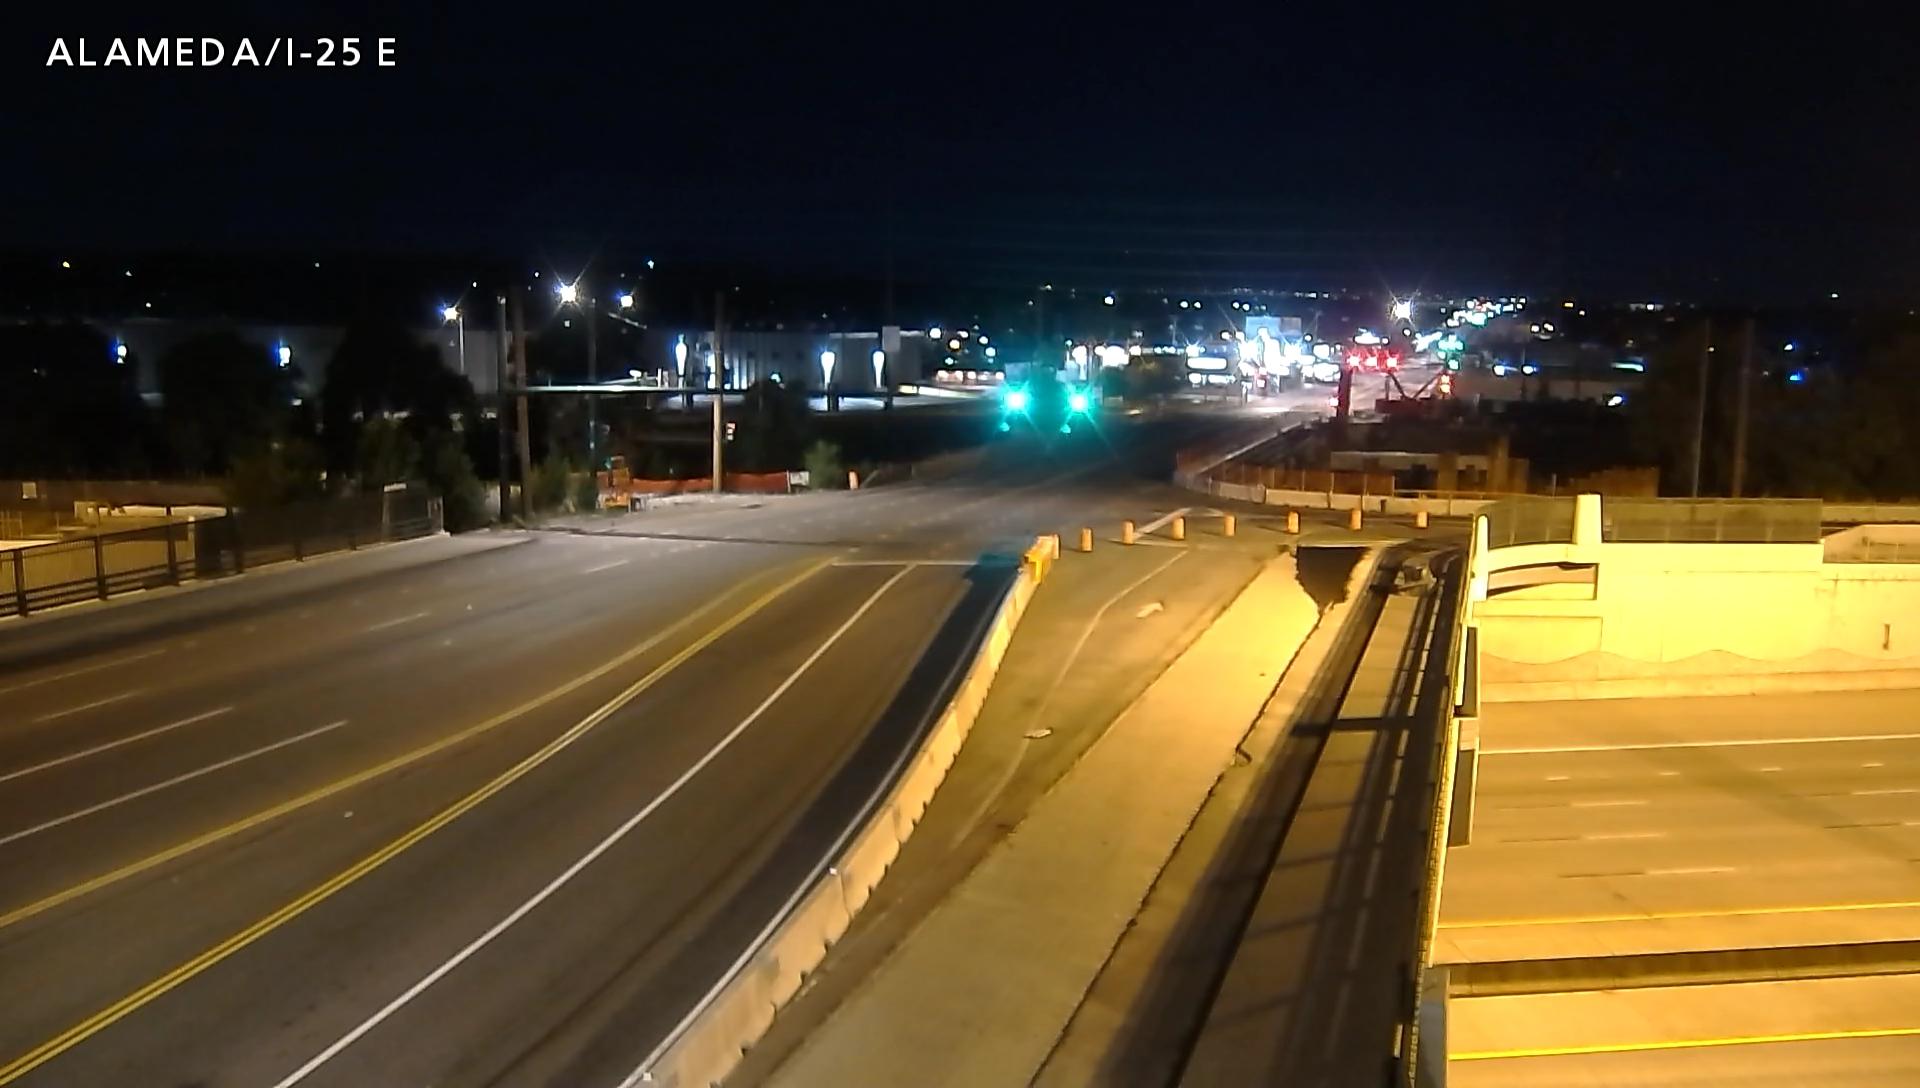 I-25 and Alameda Avenue